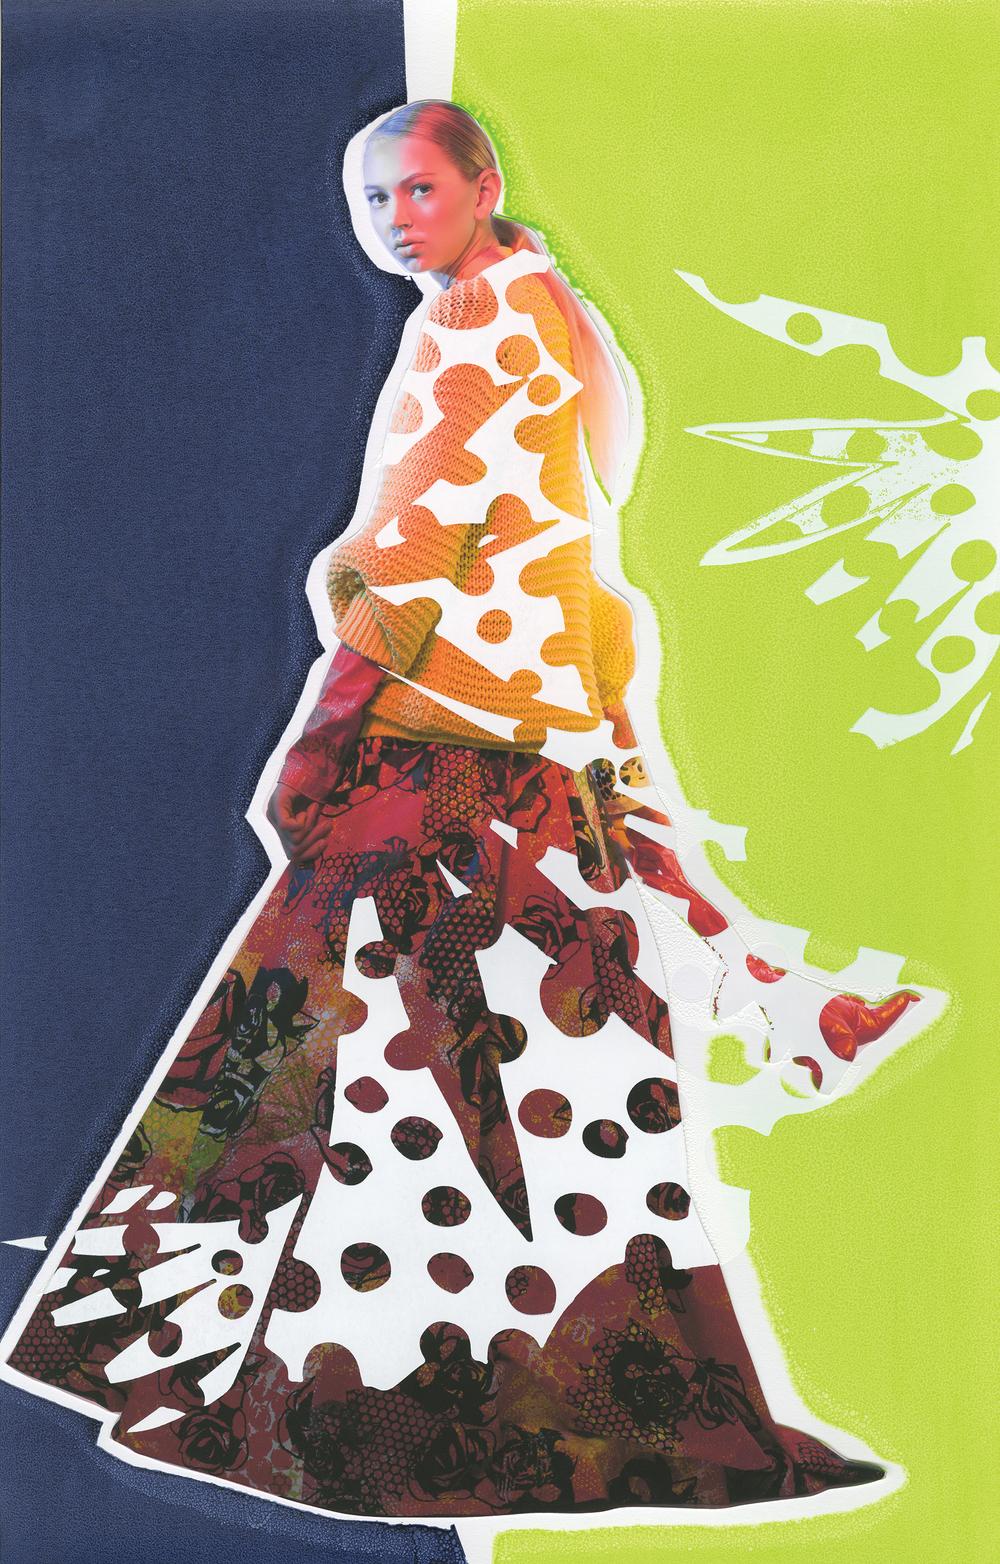 Sweater by Altazarra. Dress and Shirt by Jaci Hodges, MFA Fashion Design, and Nisha Hanna Btesh, MFA Textile Design. Mini Dinosaur Bag by BCBG MaxAzria.